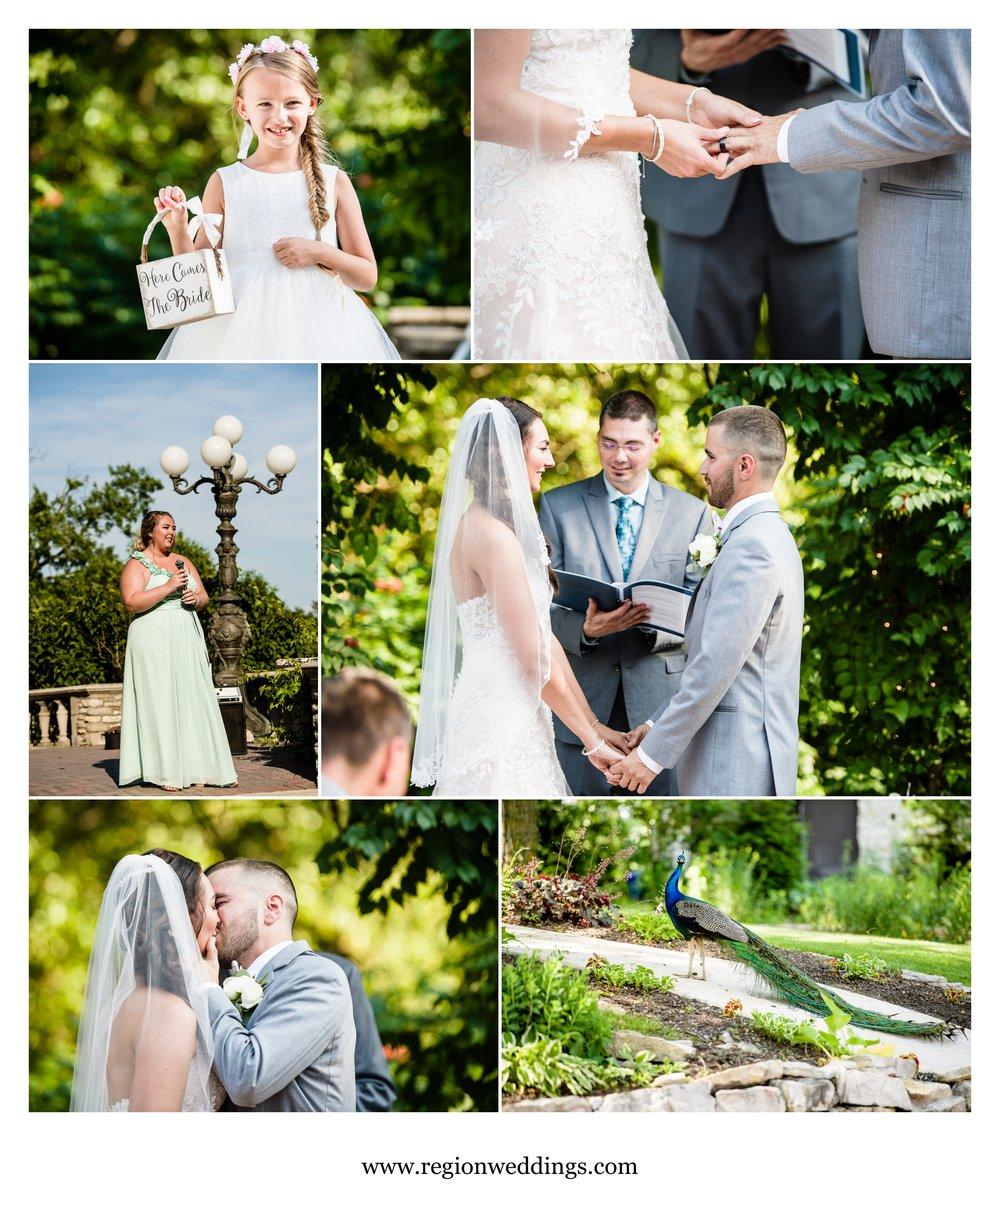 June wedding ceremony at Meyer's Castle.